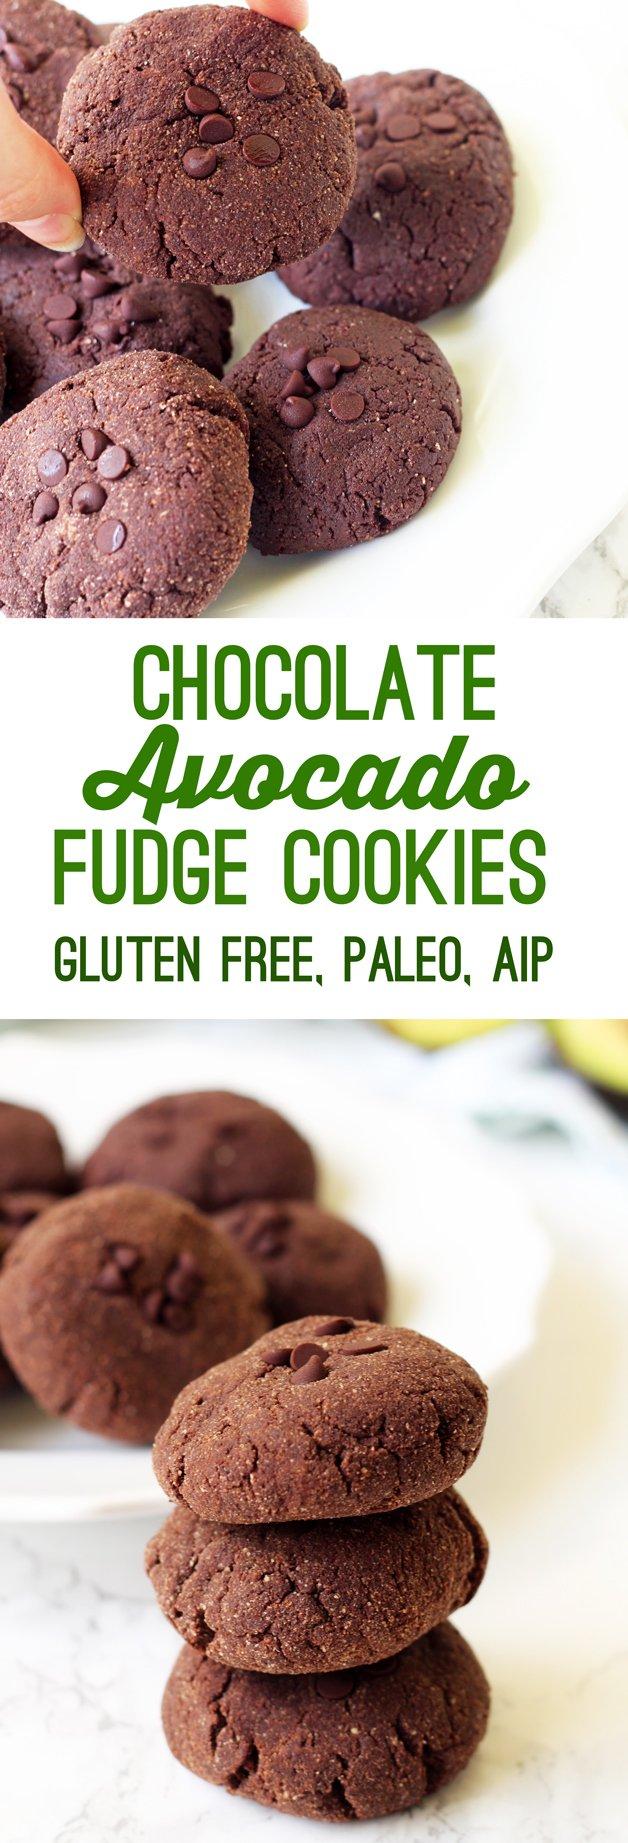 Avocado Chocolate Fudge Cookies (paleo, AIP)